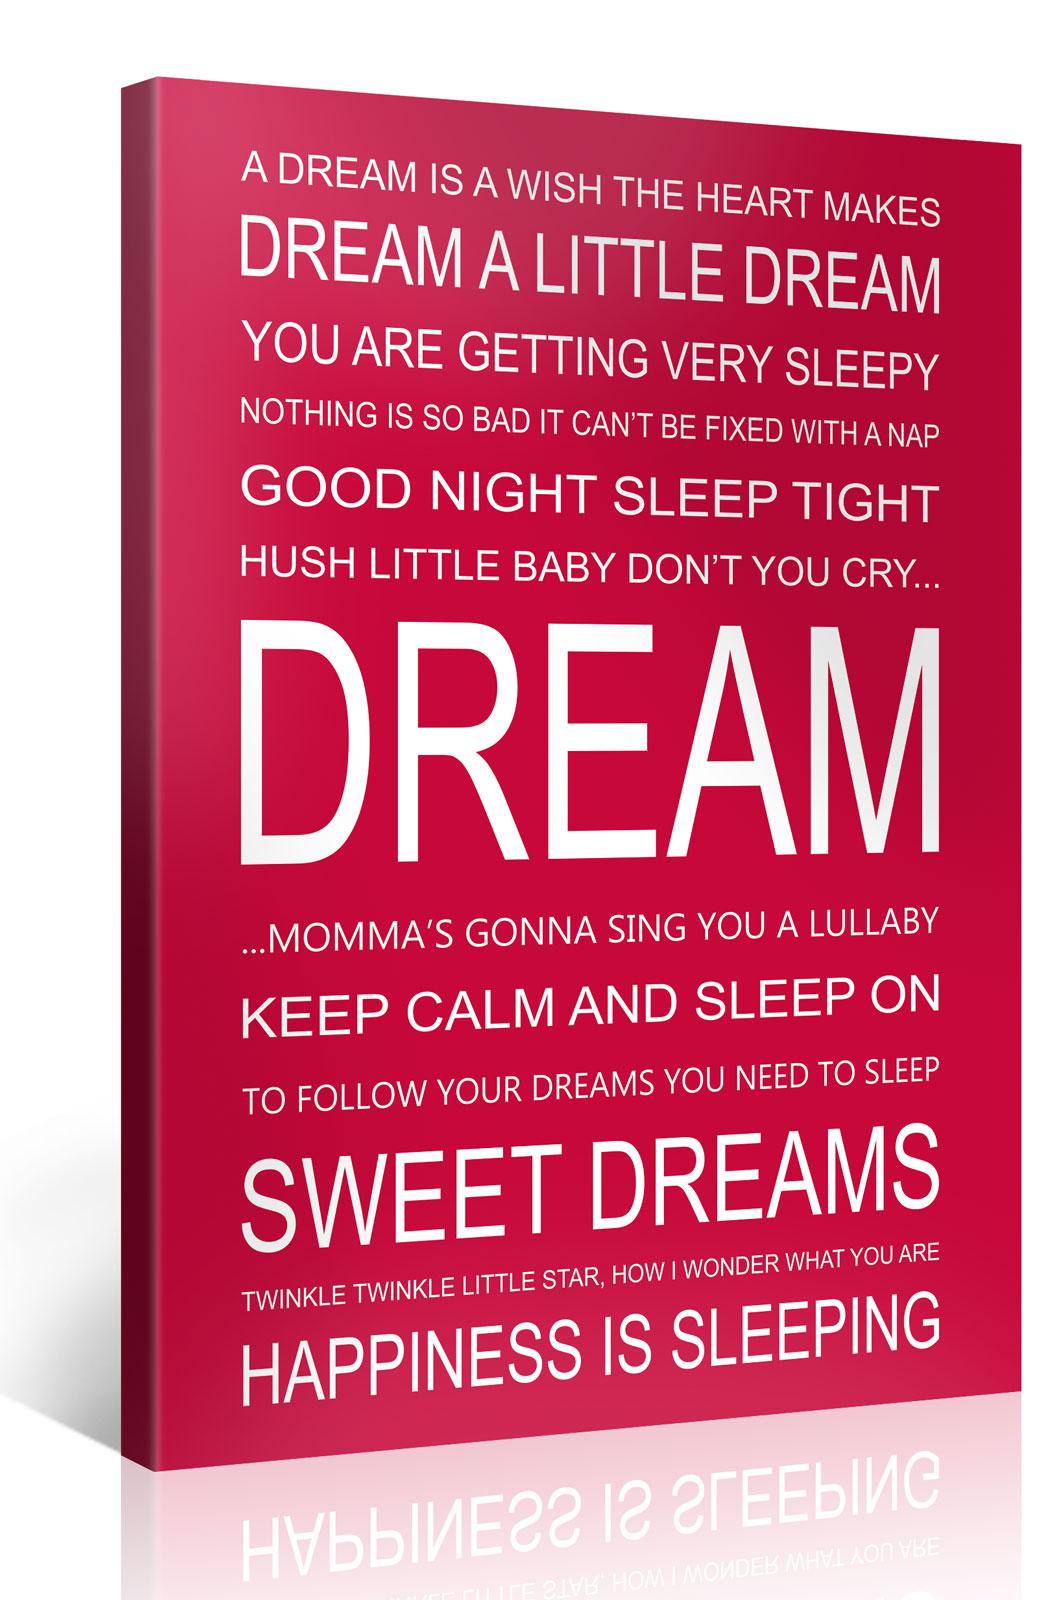 DREAM - 75x100cm Motivation Text Leinwandbild #e7251